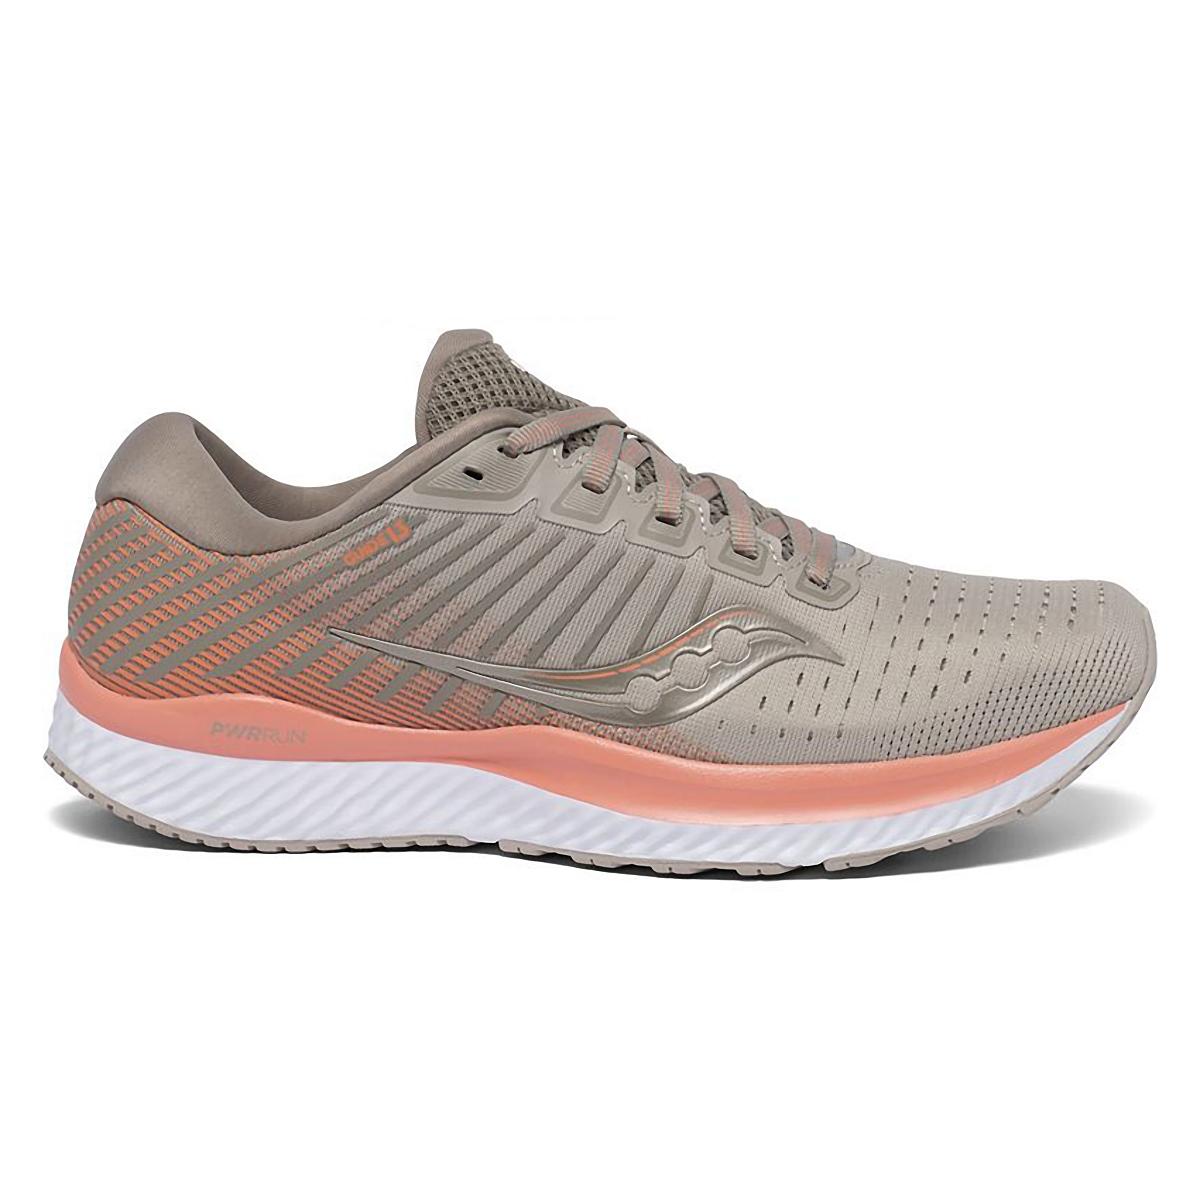 Women's Saucony Gude 13 Running Shoe - Color: Moonrock/Coral - Size: 5 - Width: Regular, Moonrock/Coral, large, image 1